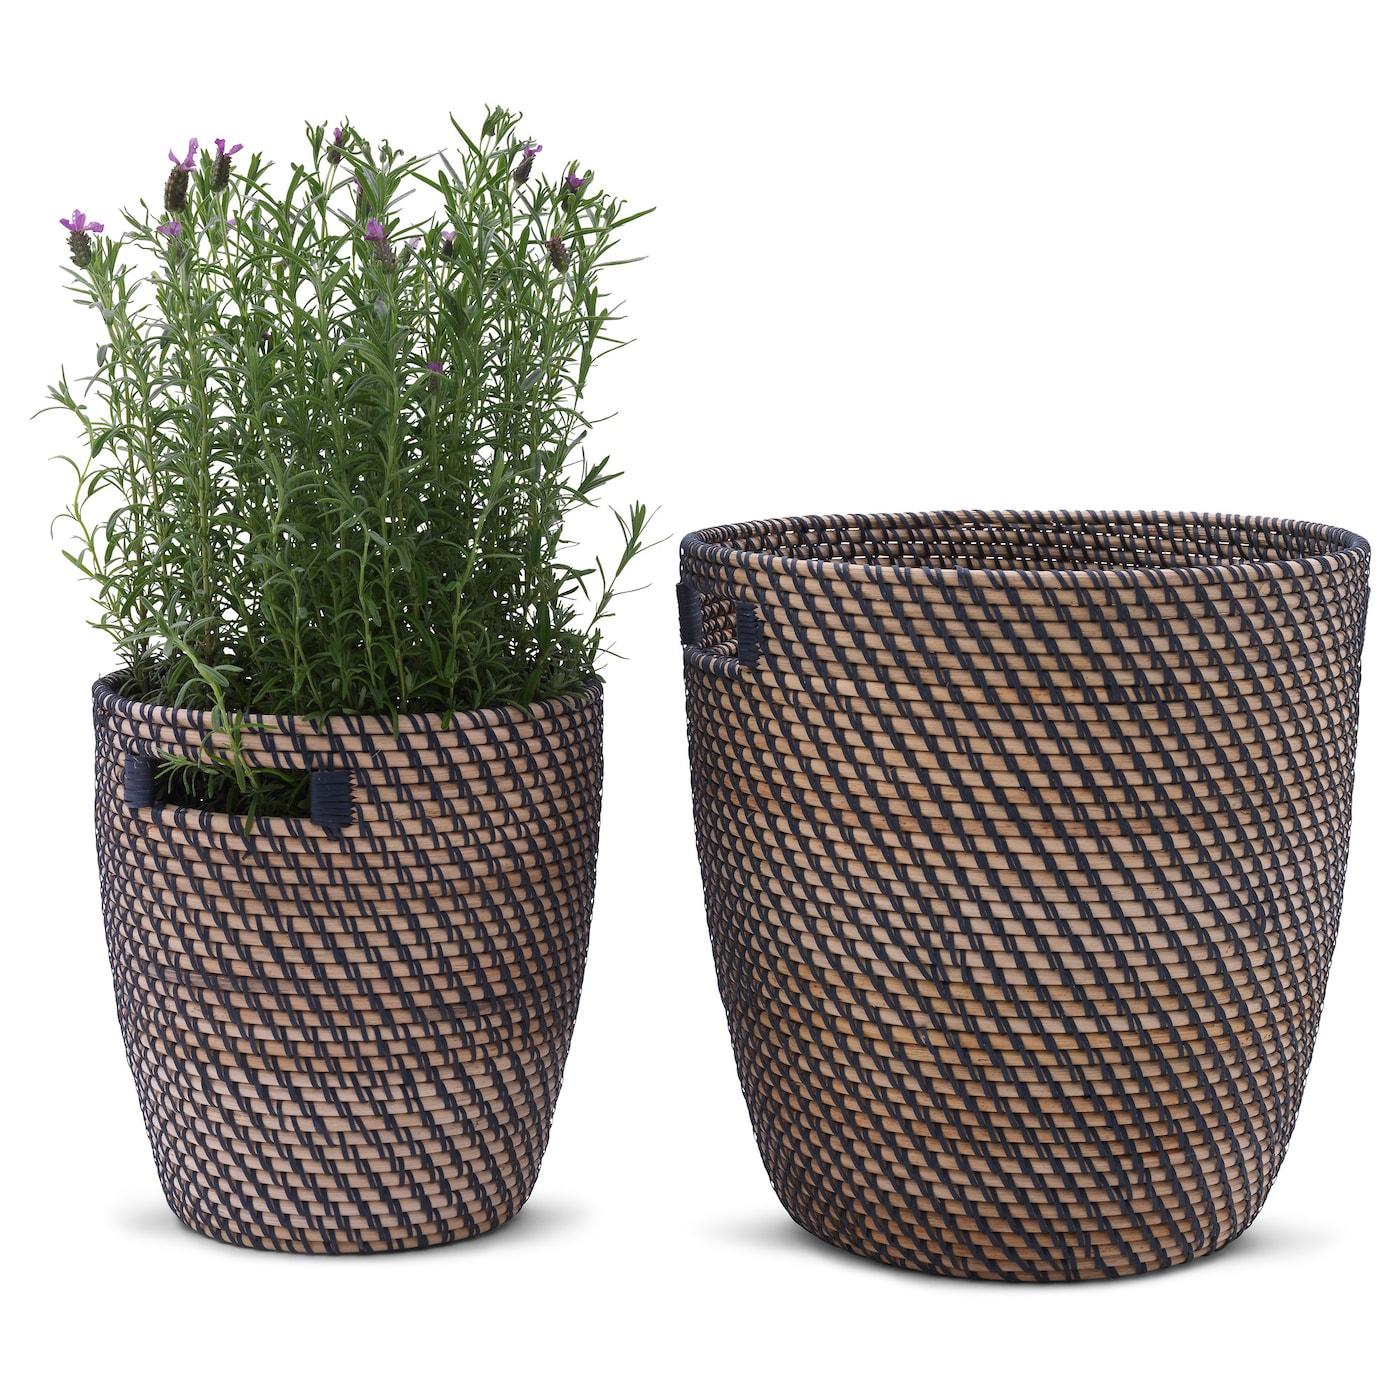 r gkorn plant pot rattan 24 cm ikea. Black Bedroom Furniture Sets. Home Design Ideas